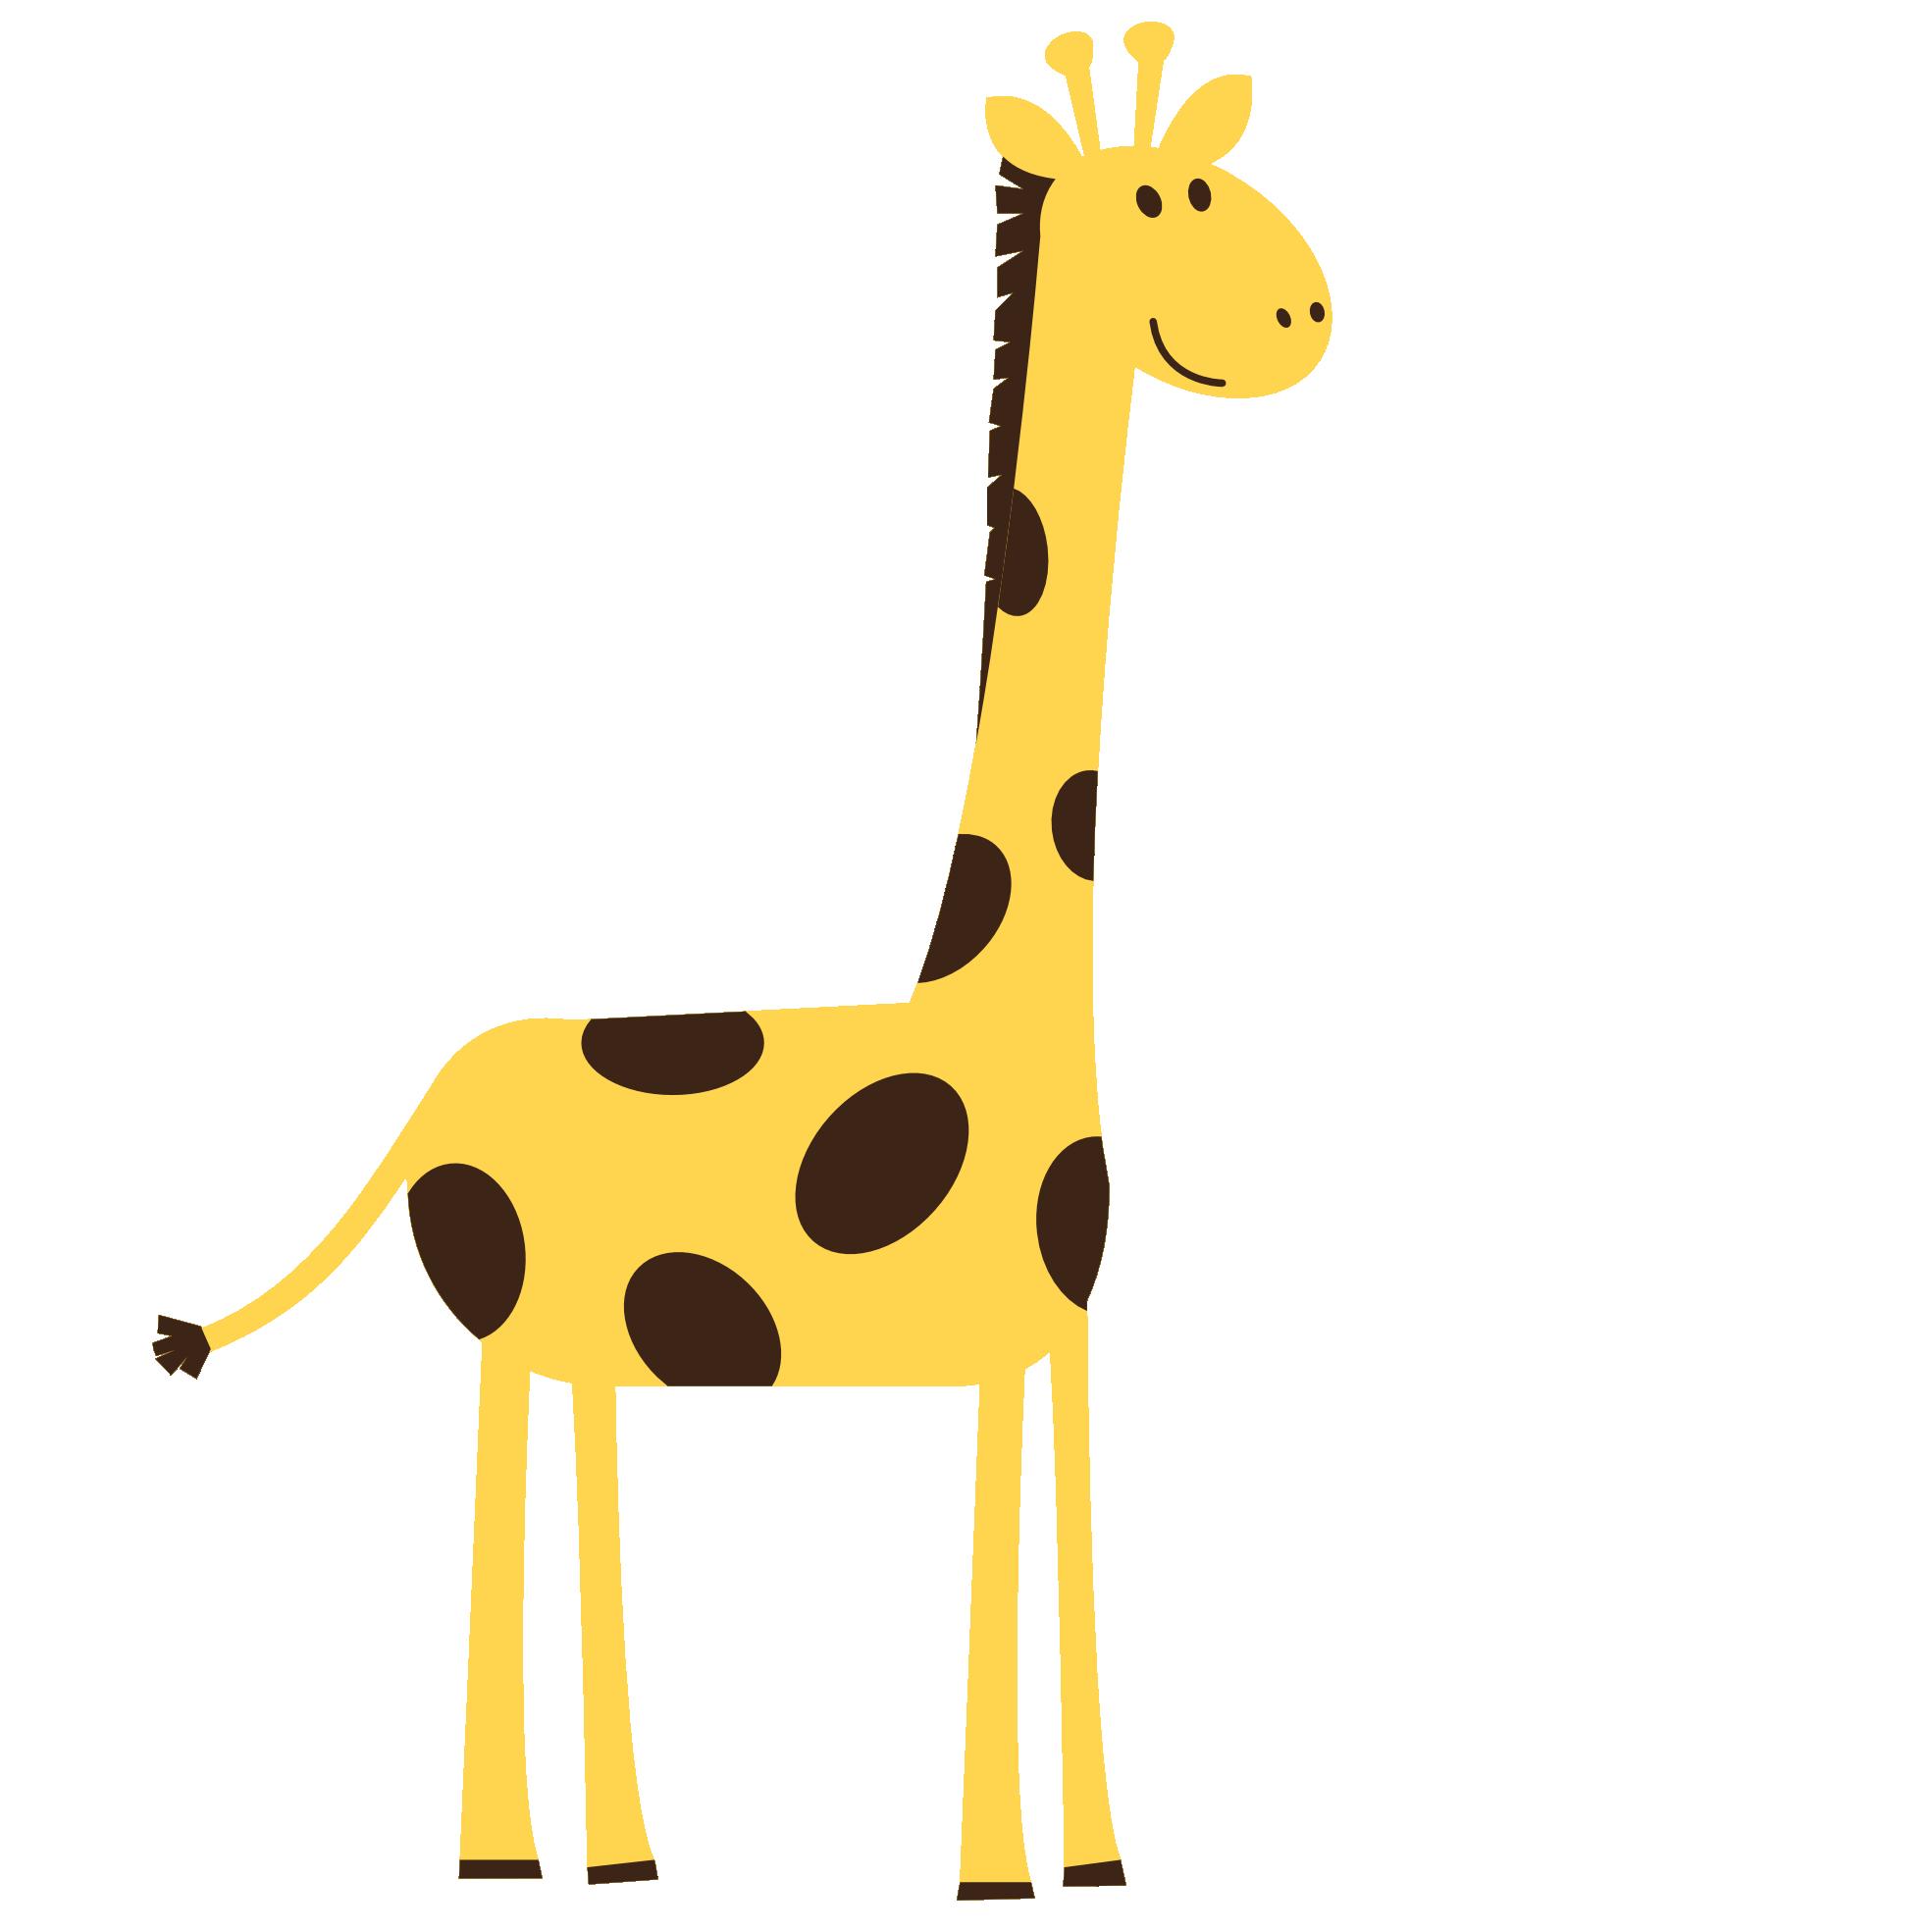 1969x1969 Giraffe Clipart Black And White Clipart Panda